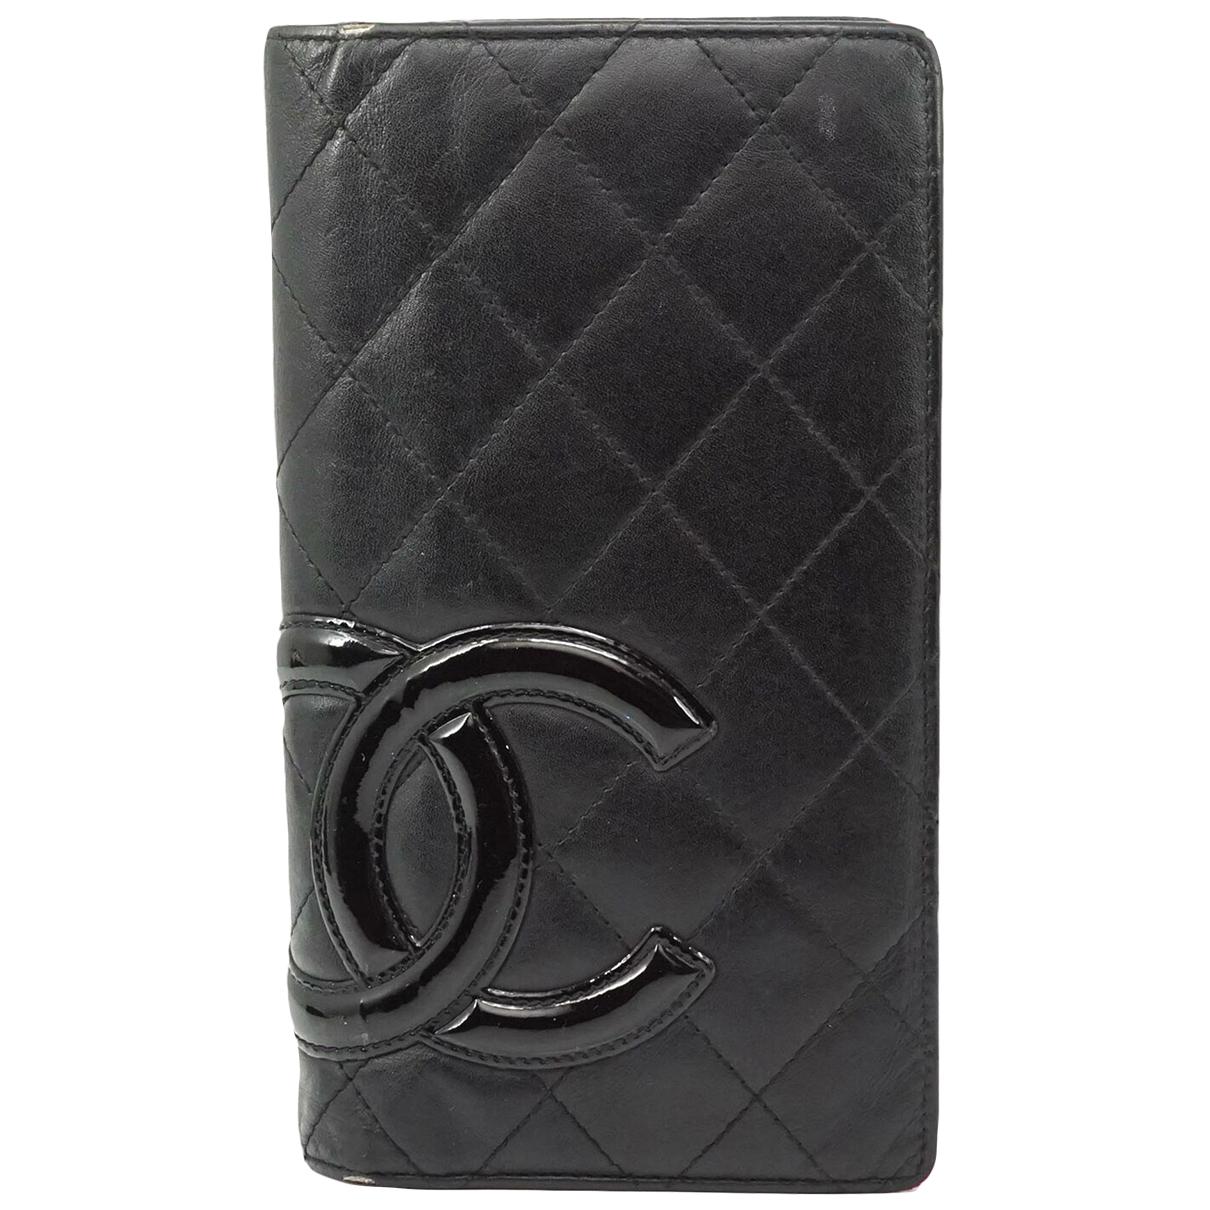 Chanel N Leather wallet for Women N